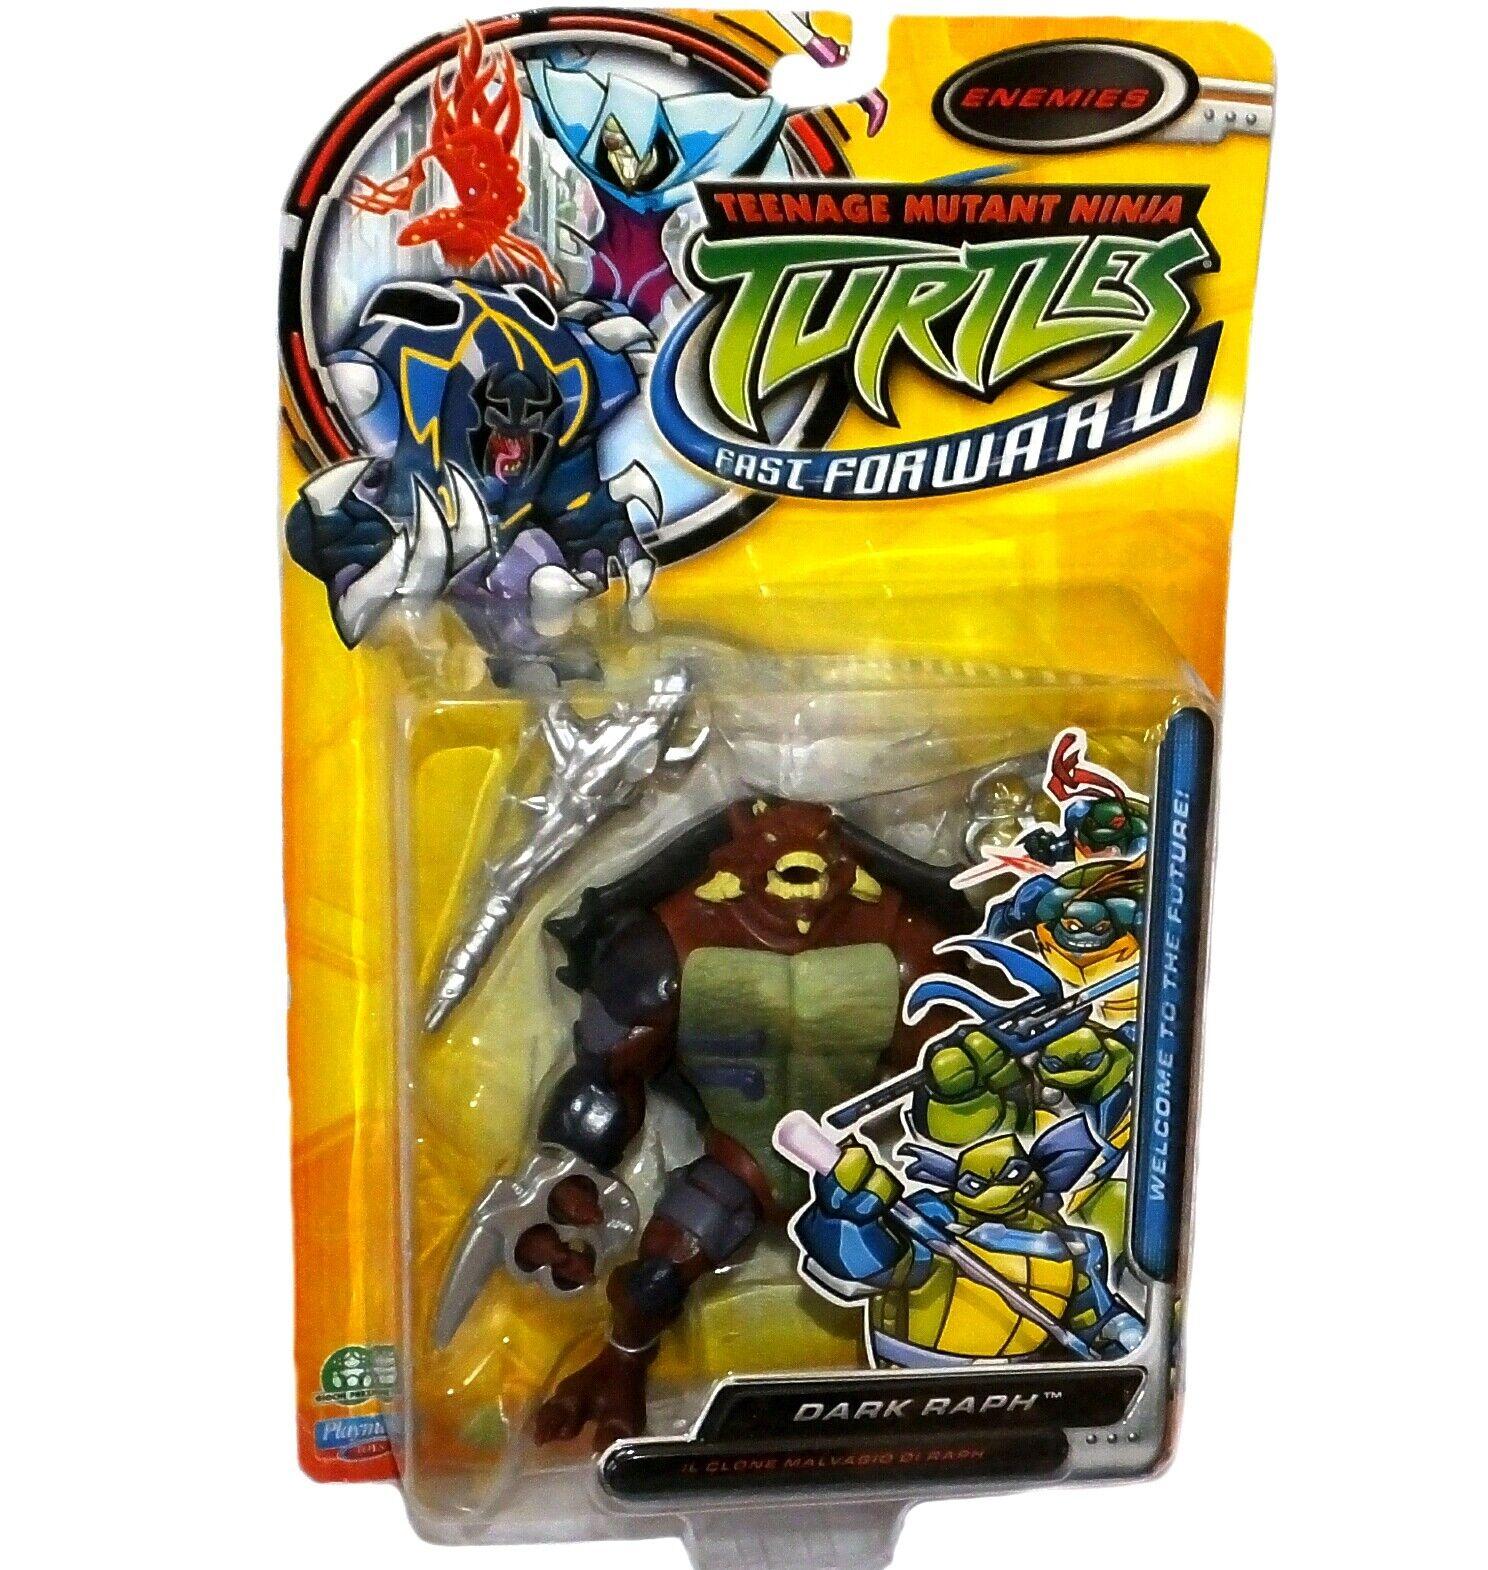 Teenage Mutant Ninja Turtles Fast Forward Dark Raph Rapheal New Factory Sealed